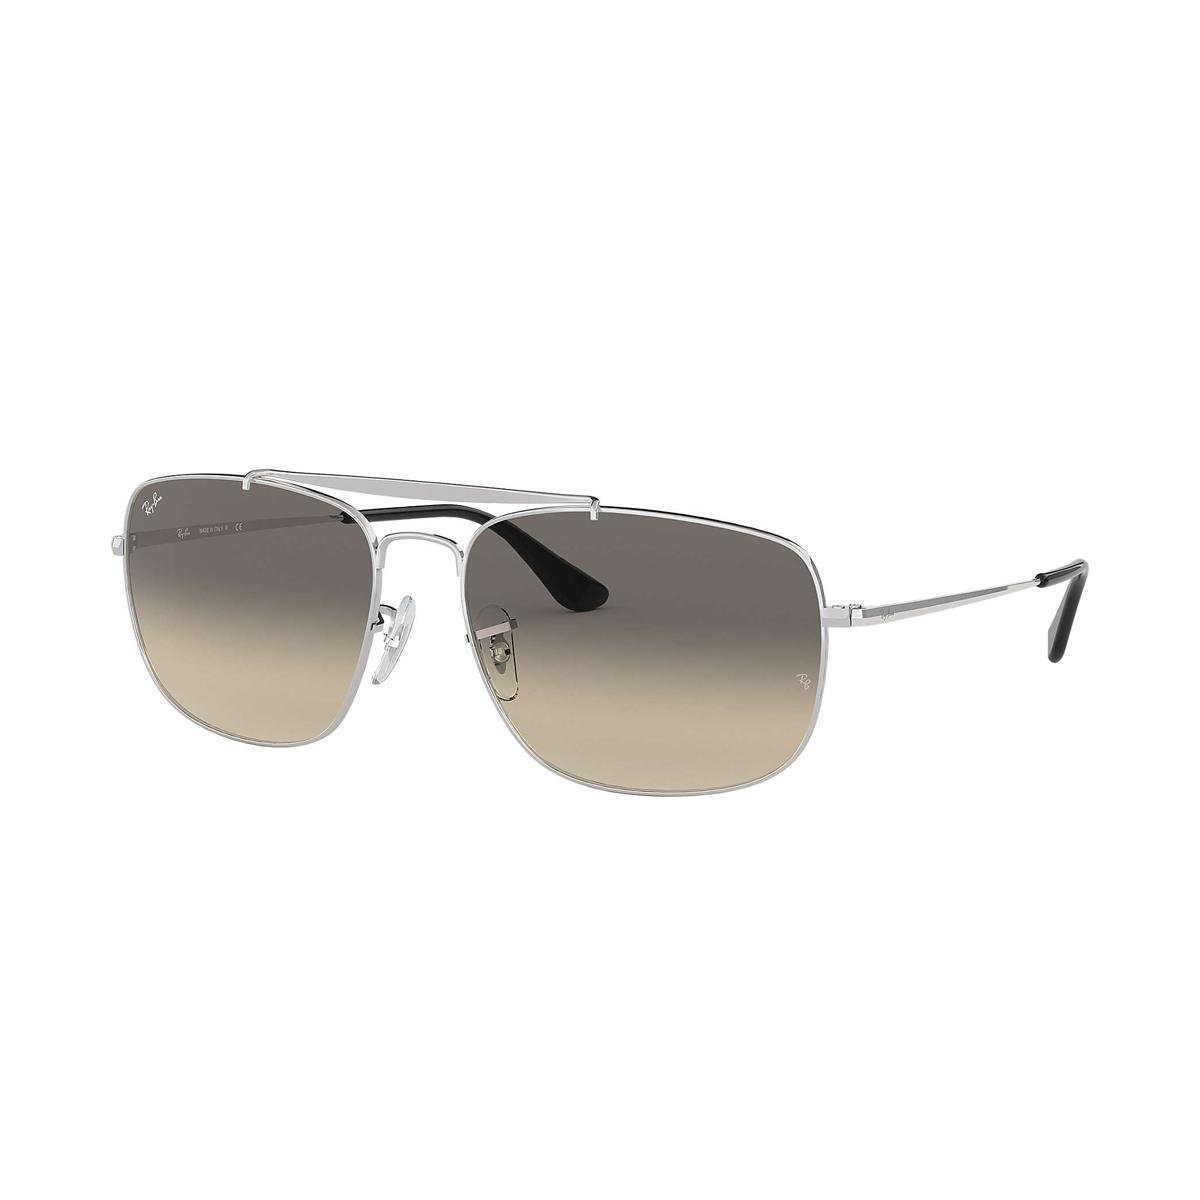 Óculos de Sol Ray-Ban Colonel RB3560 Feminino - Prata - Compre Agora ... 28ae4ae0a4